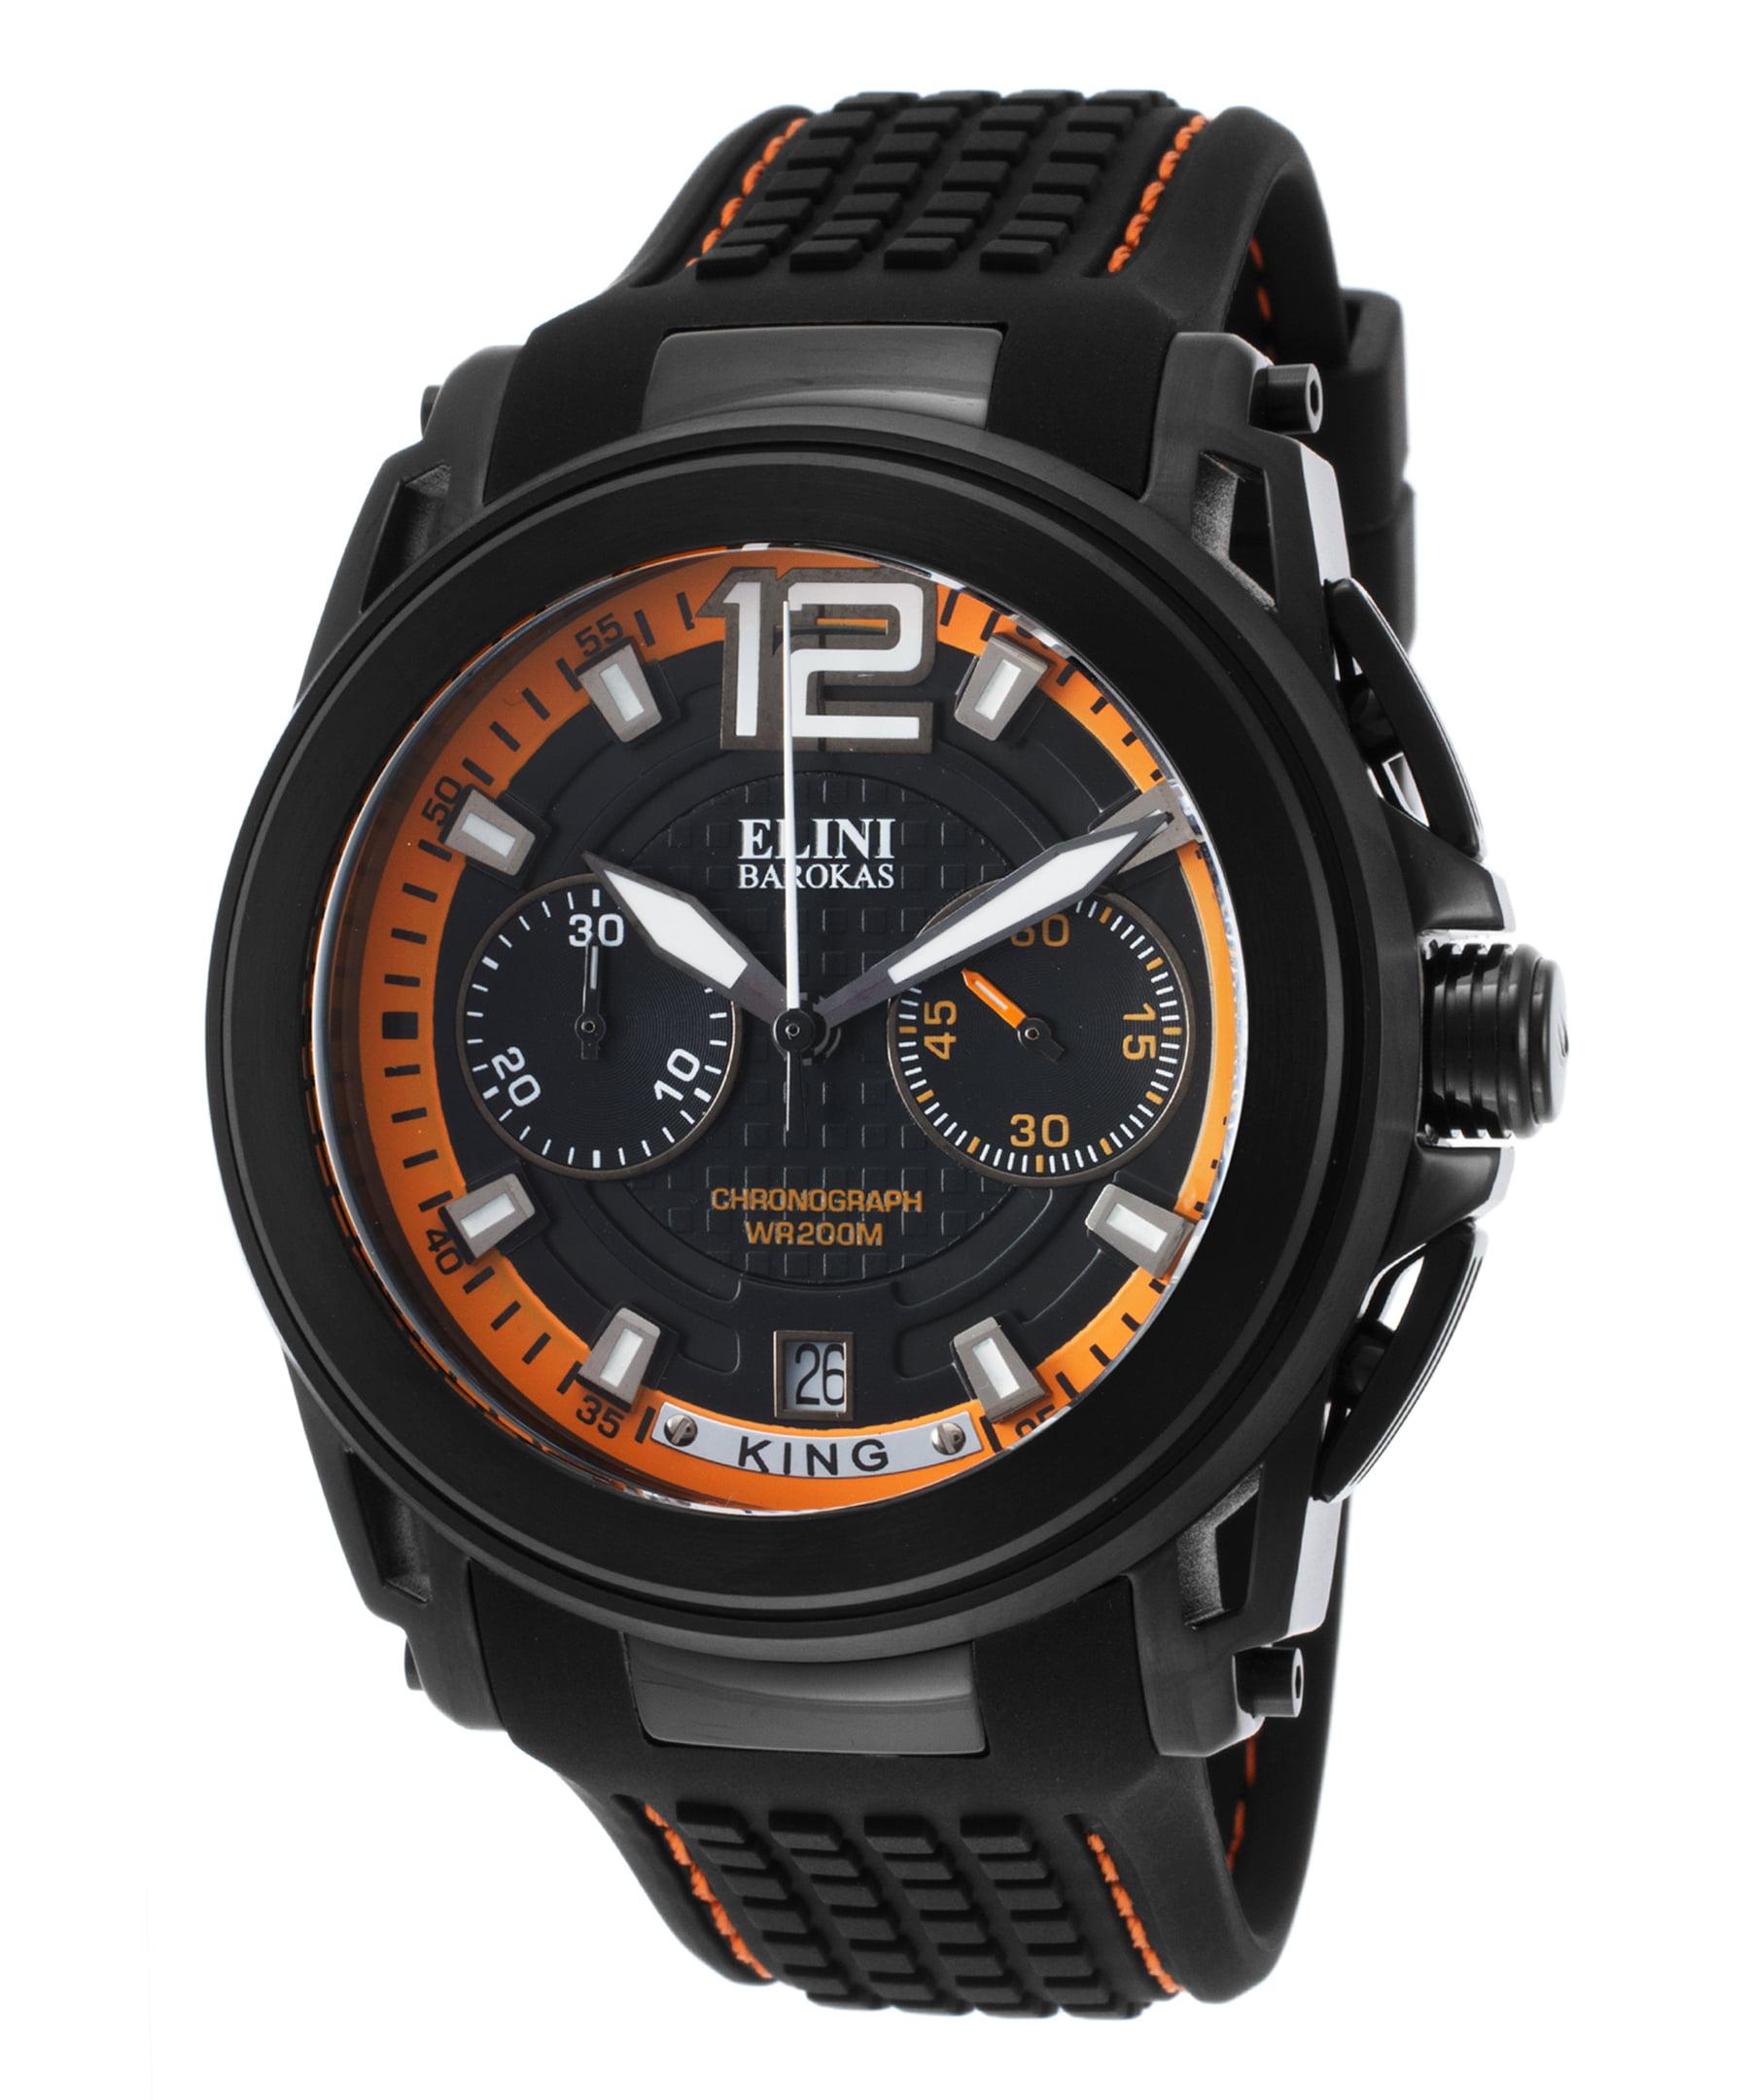 Elini Barokas 20014-Bb-01-Oa King Chronograph Black Silicone And Dial Orange Accent Watch